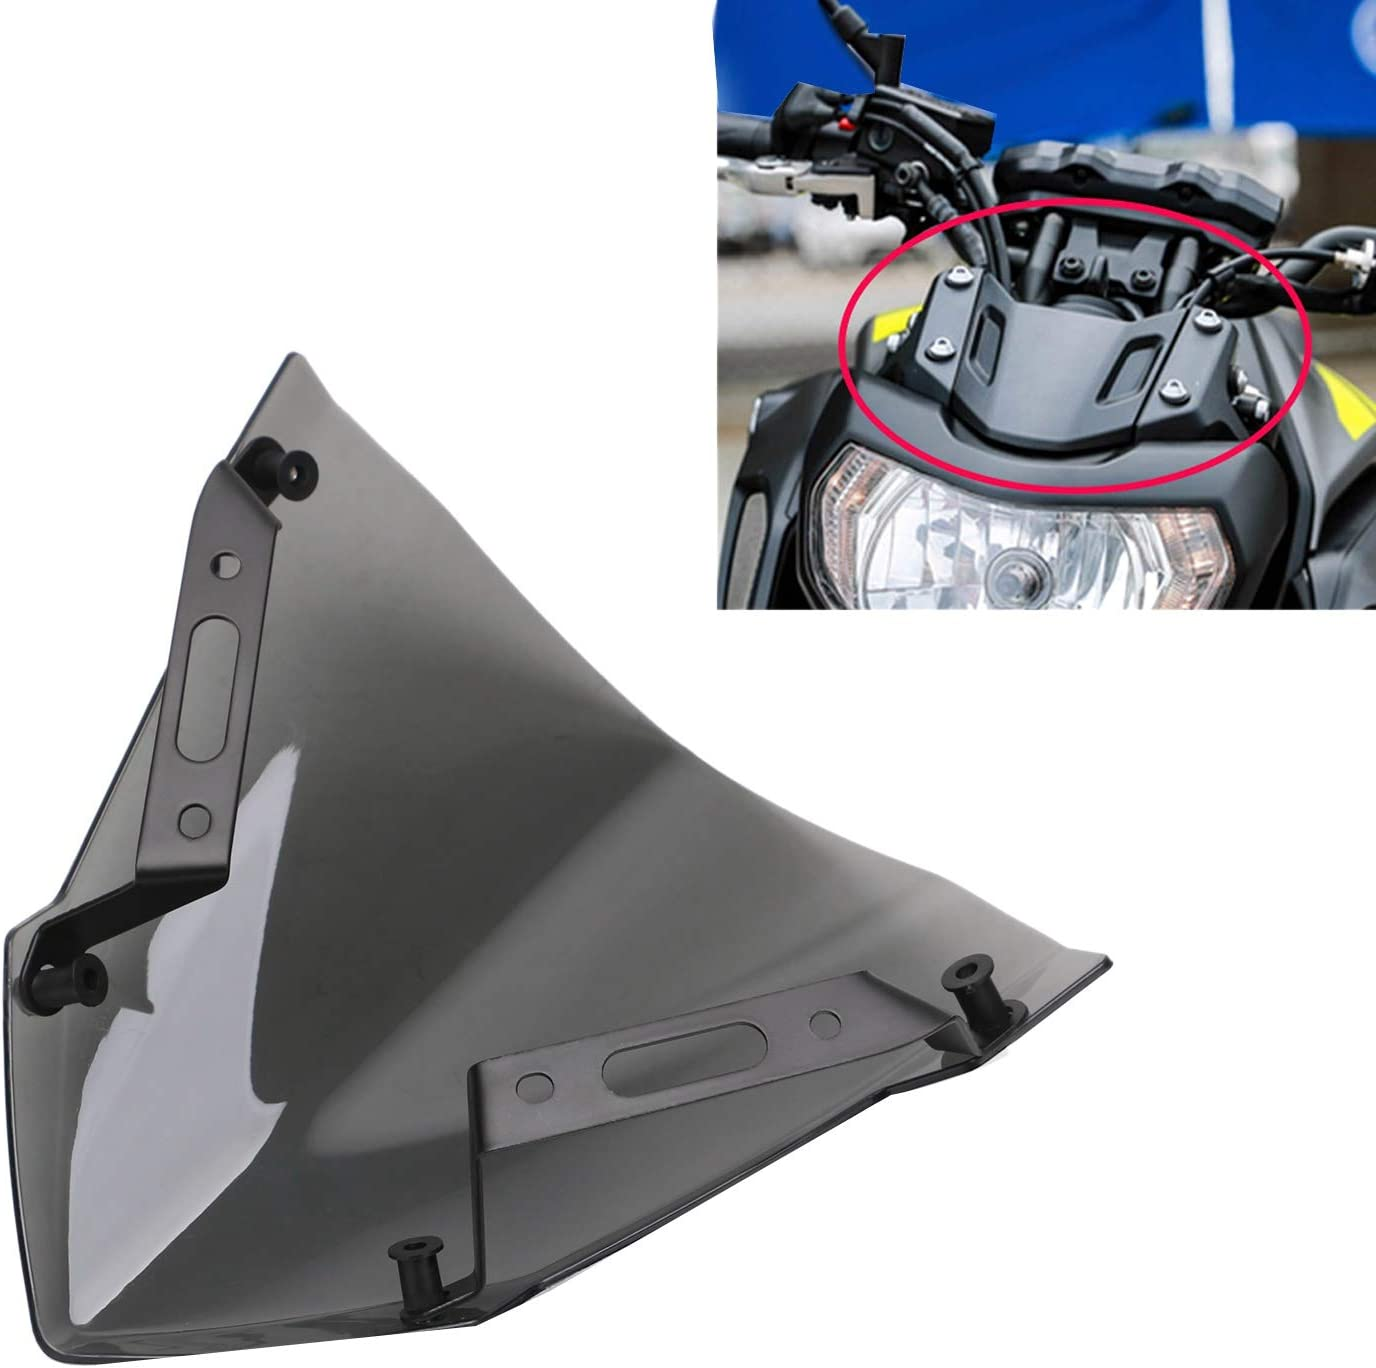 Moligh doll Windshield Windscreen for MT-07 FZ-07 2018 2019 2020 Motorcycle Accessories Pare-Brise Wind Deflectors MT07 FZ07 MT FZ 07